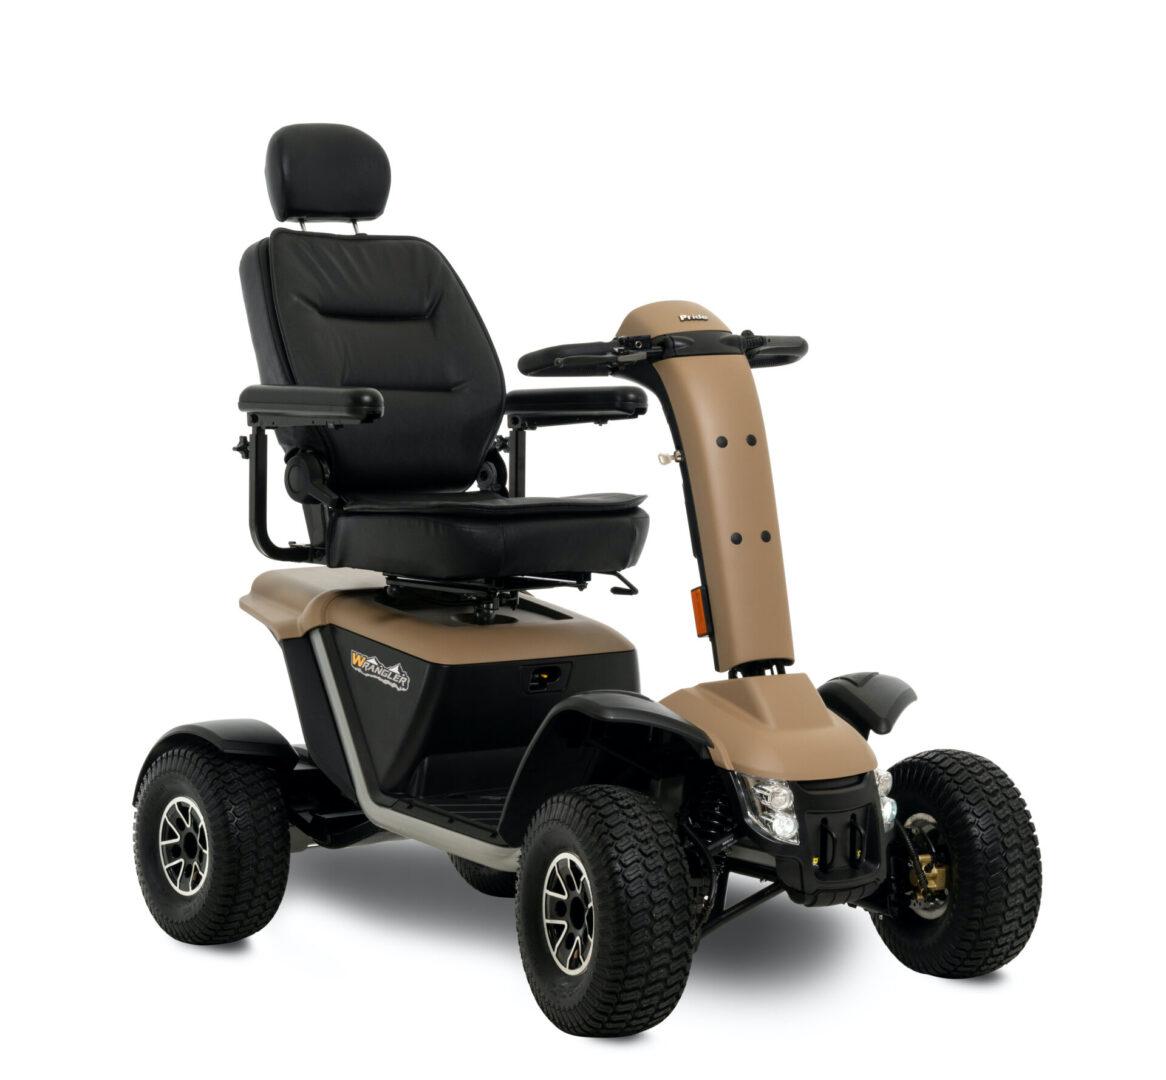 Small Image of the Pride Mobility Wrangler in Desert Sand